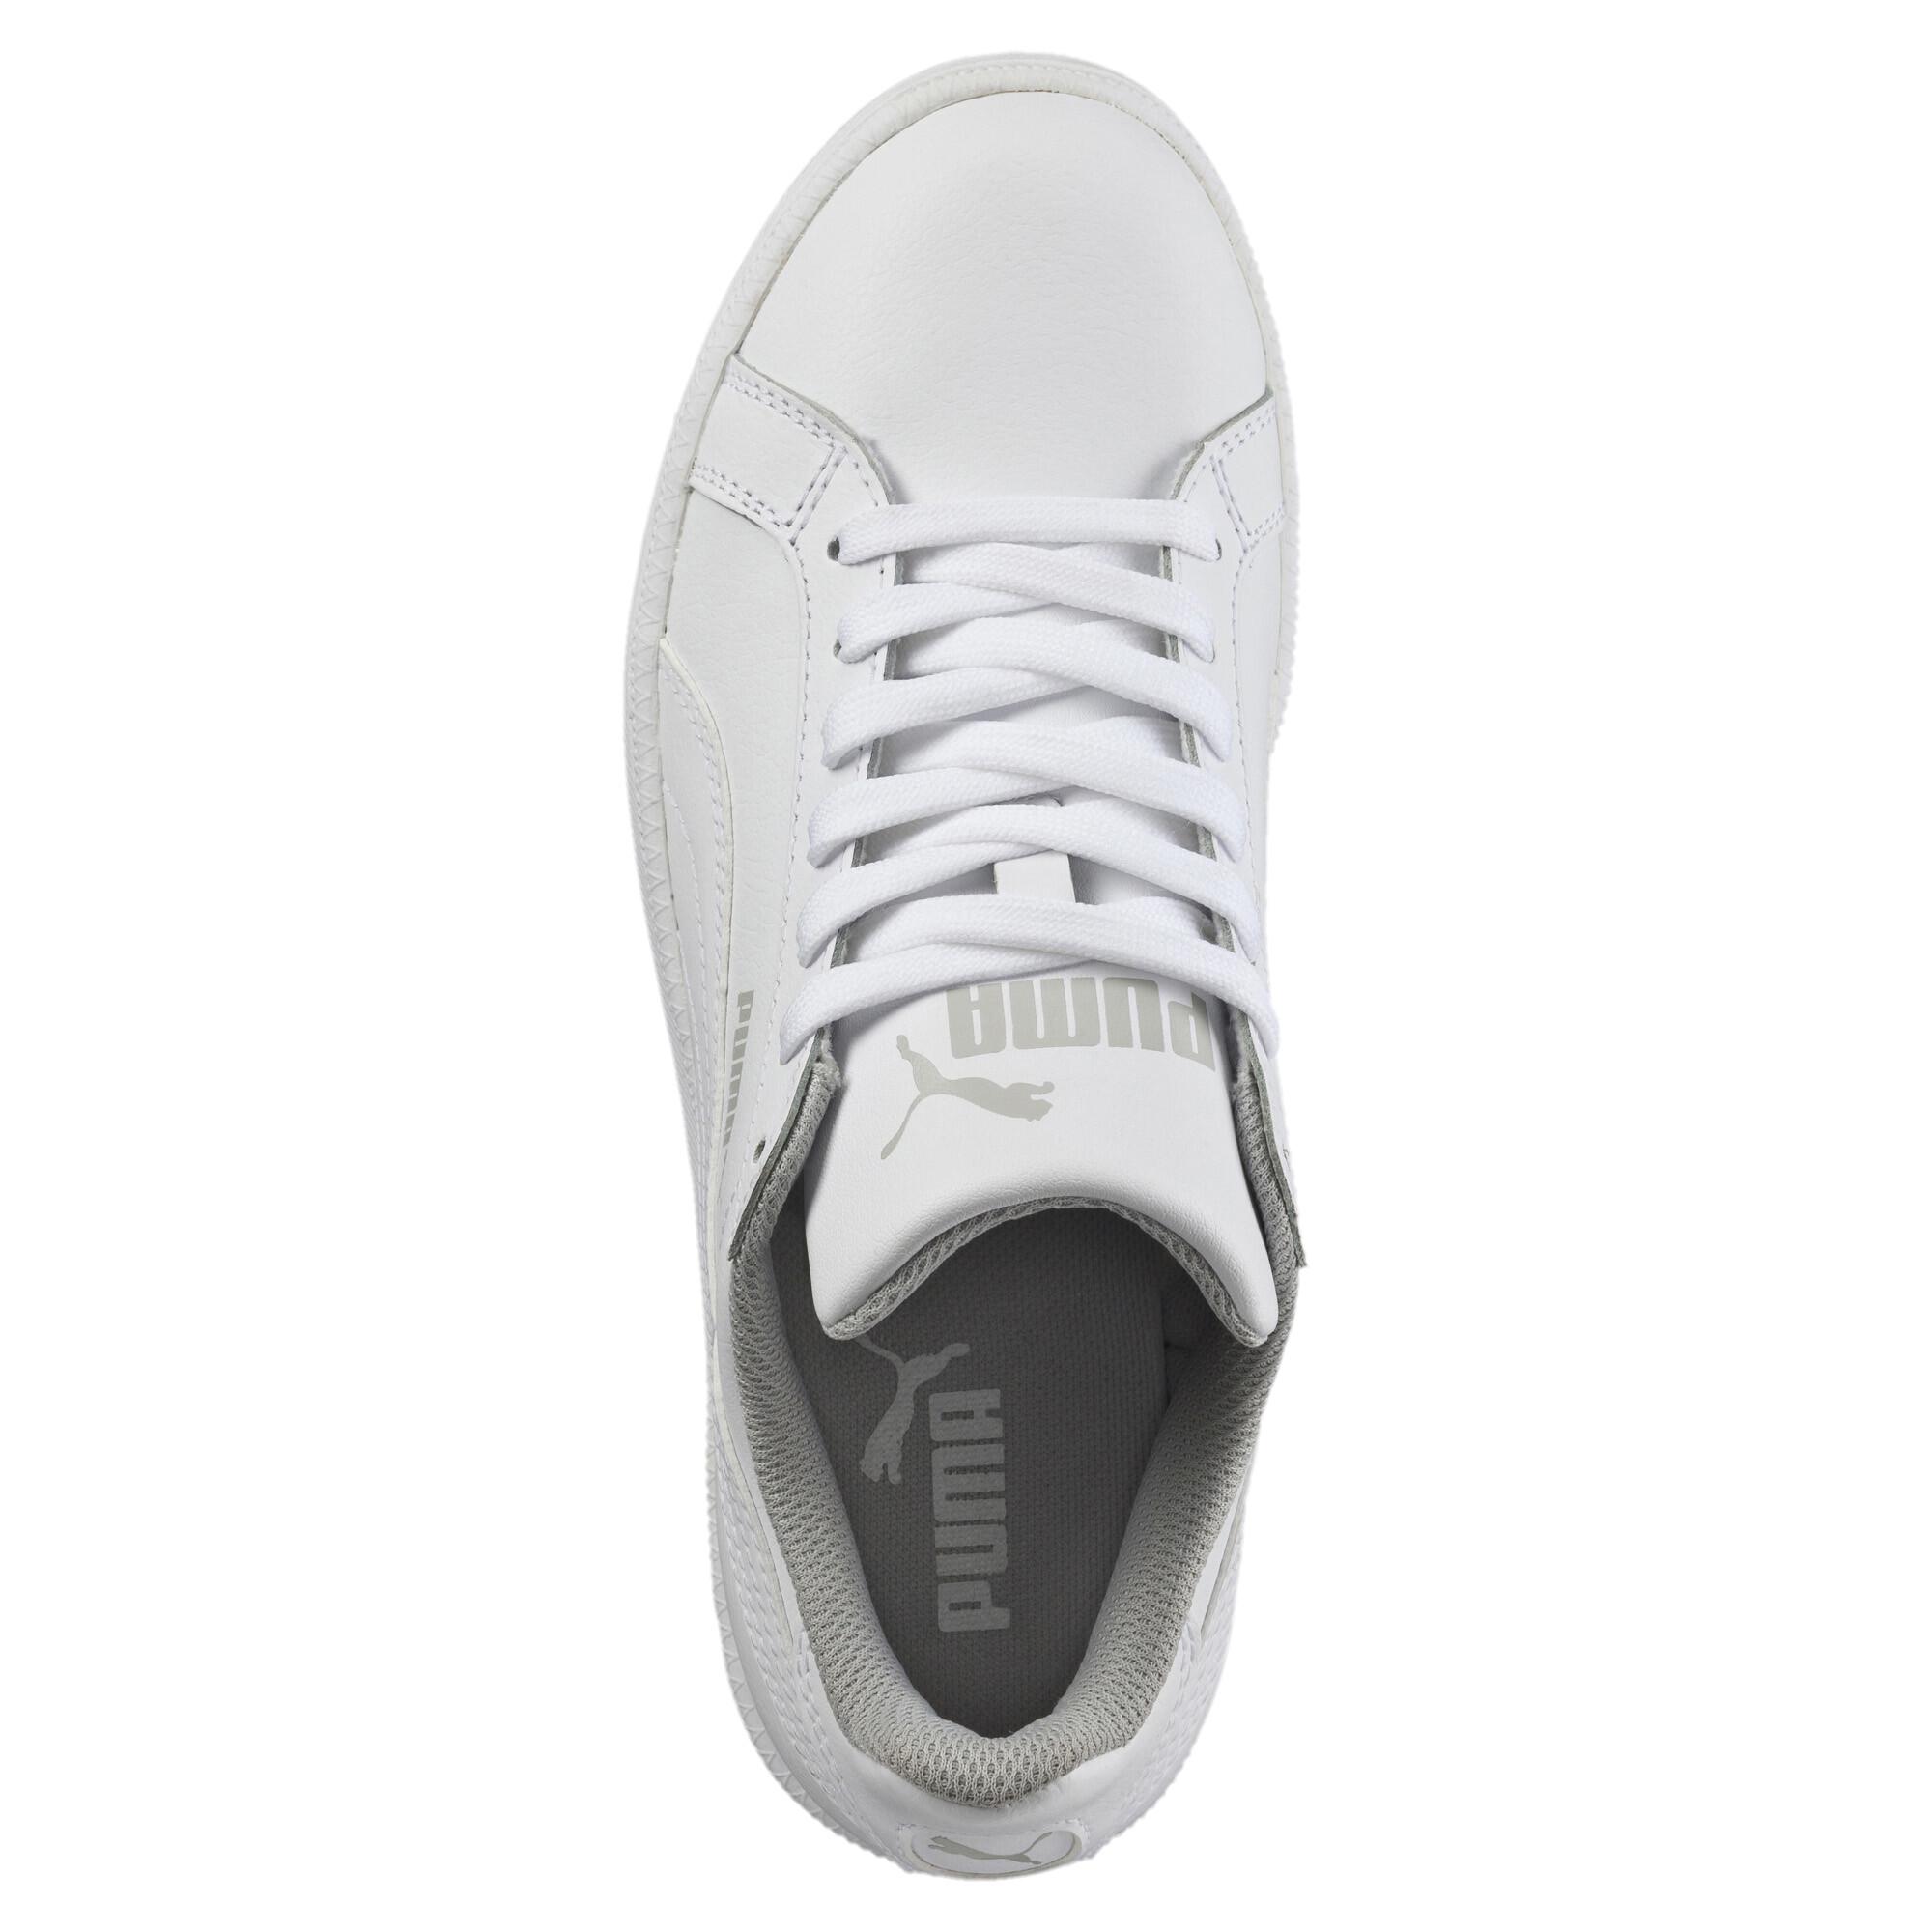 PUMA-Smash-Jr-Sneaker-Unisex-Schuhe-Kinder-Neu Indexbild 11